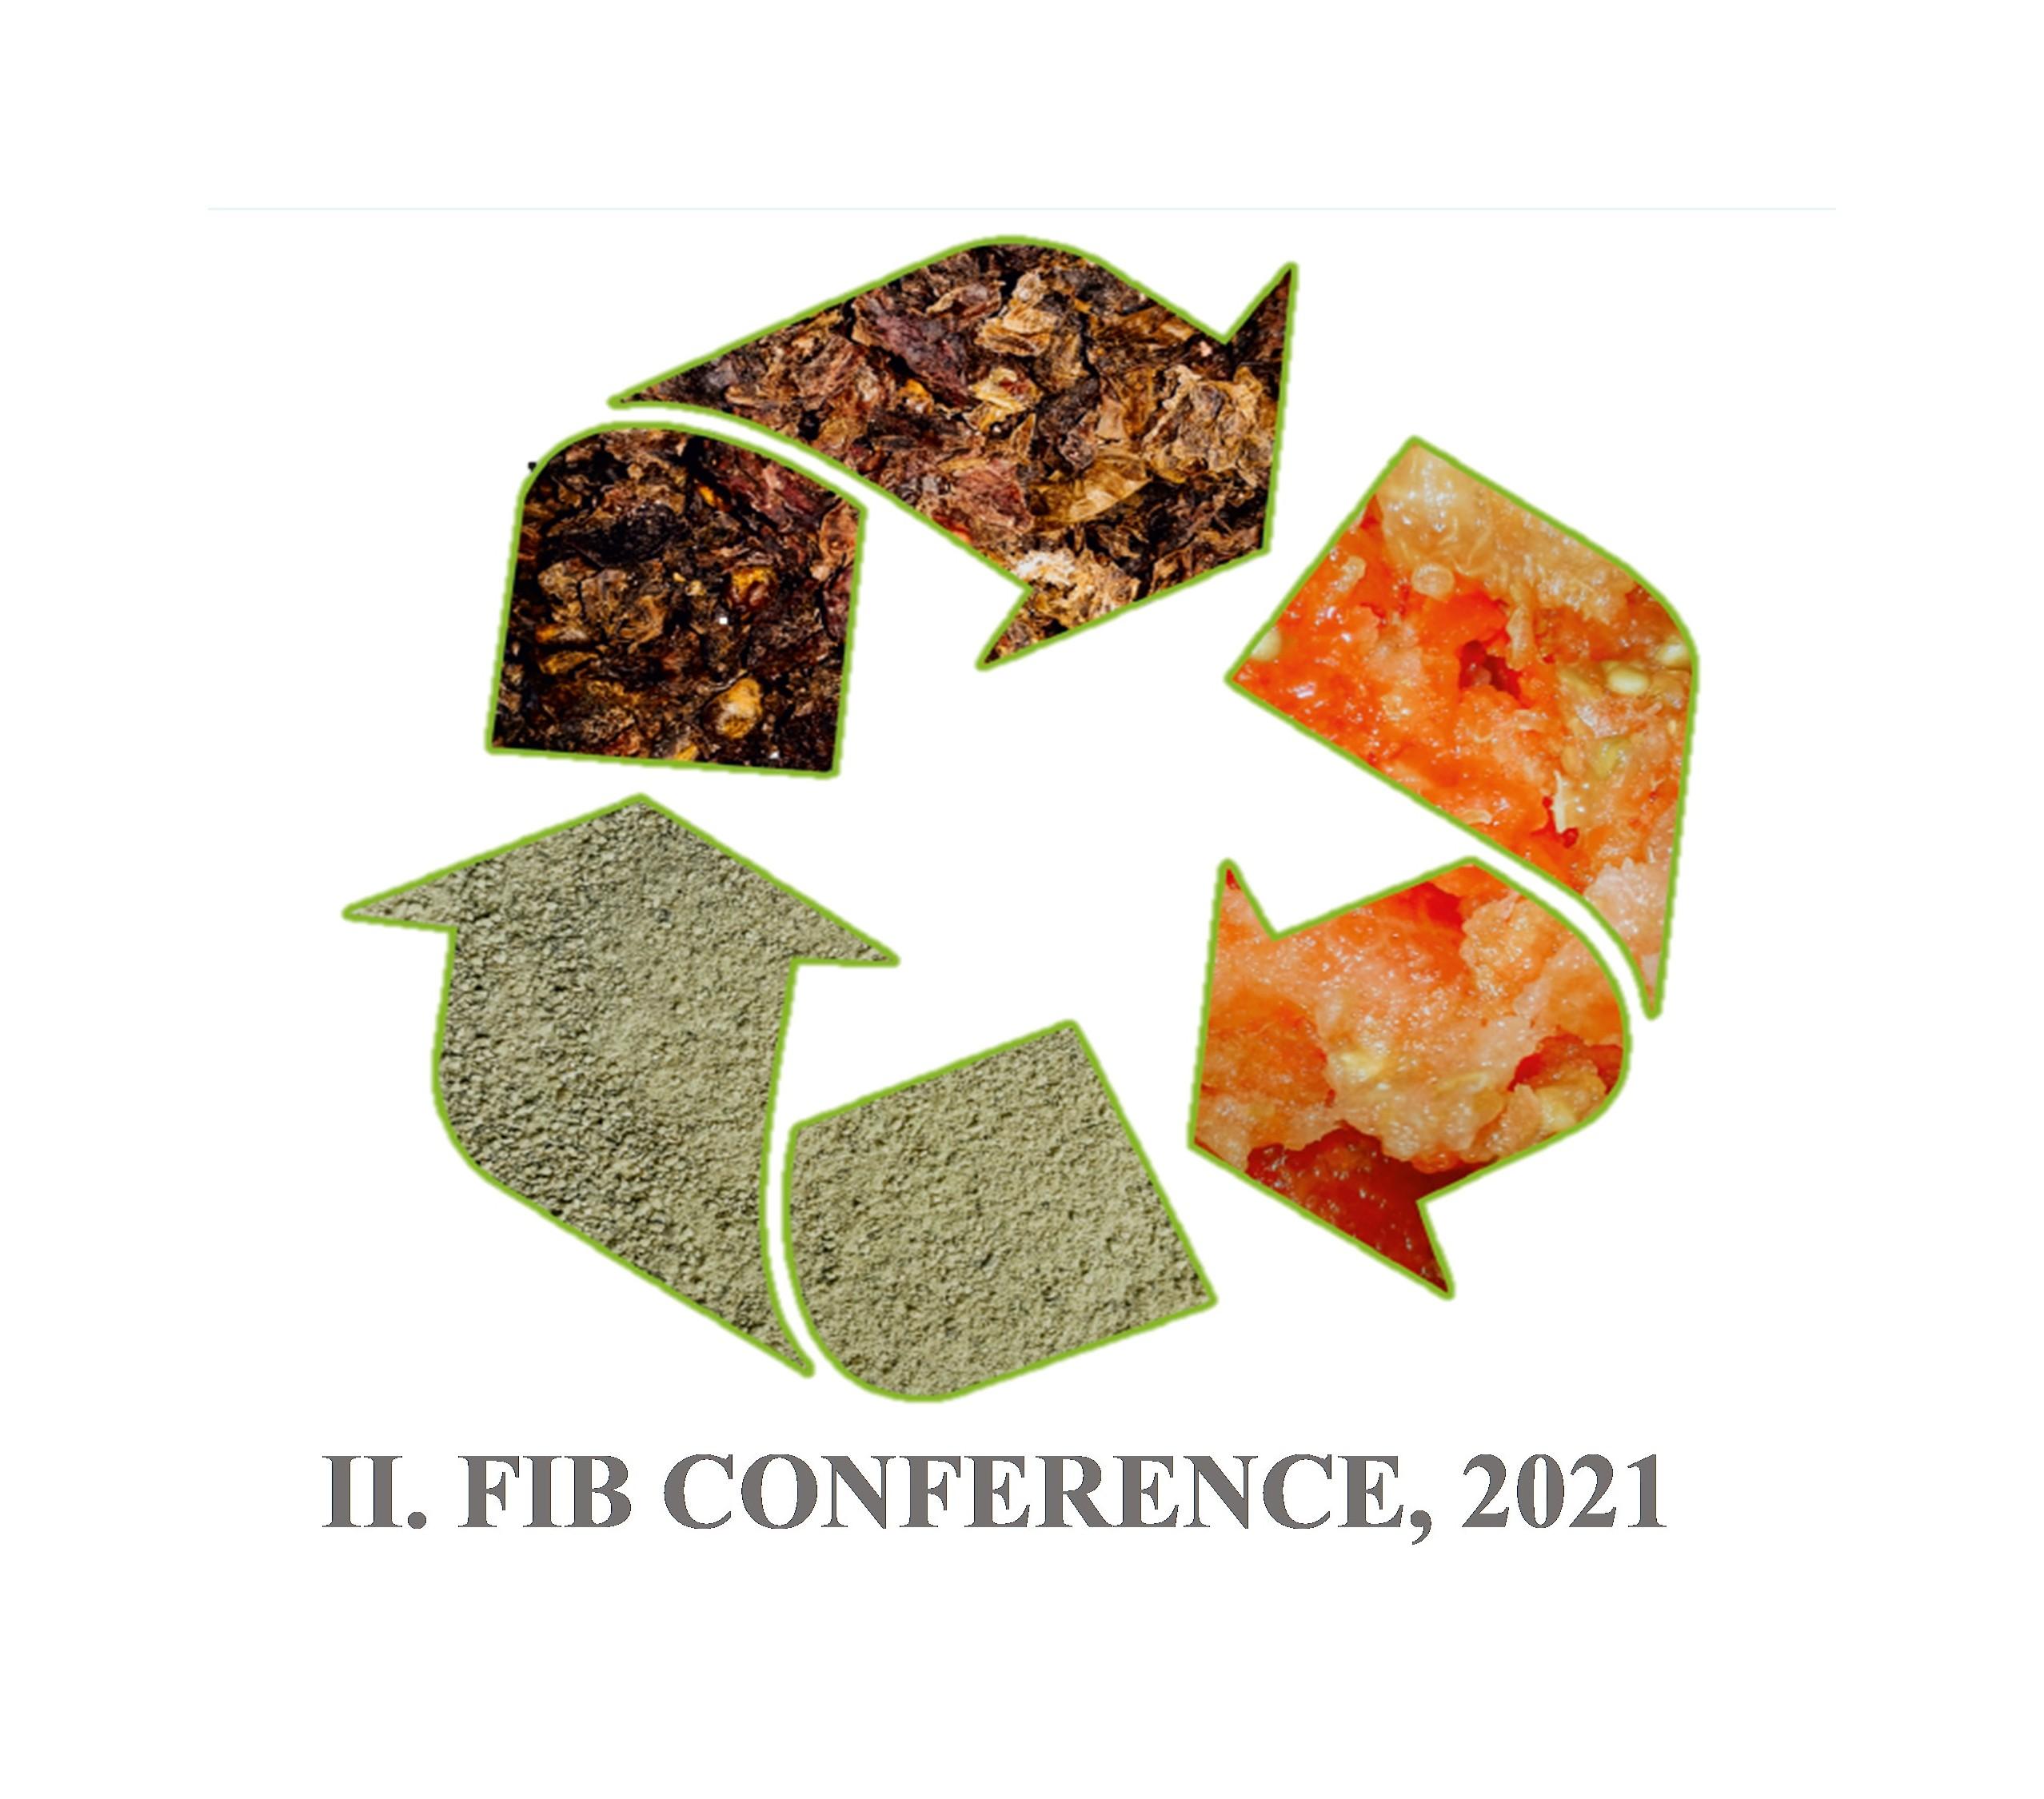 2. međunarodni znanstveno-stručni skup FOOD INDUSTRY BY-PRODUCTS